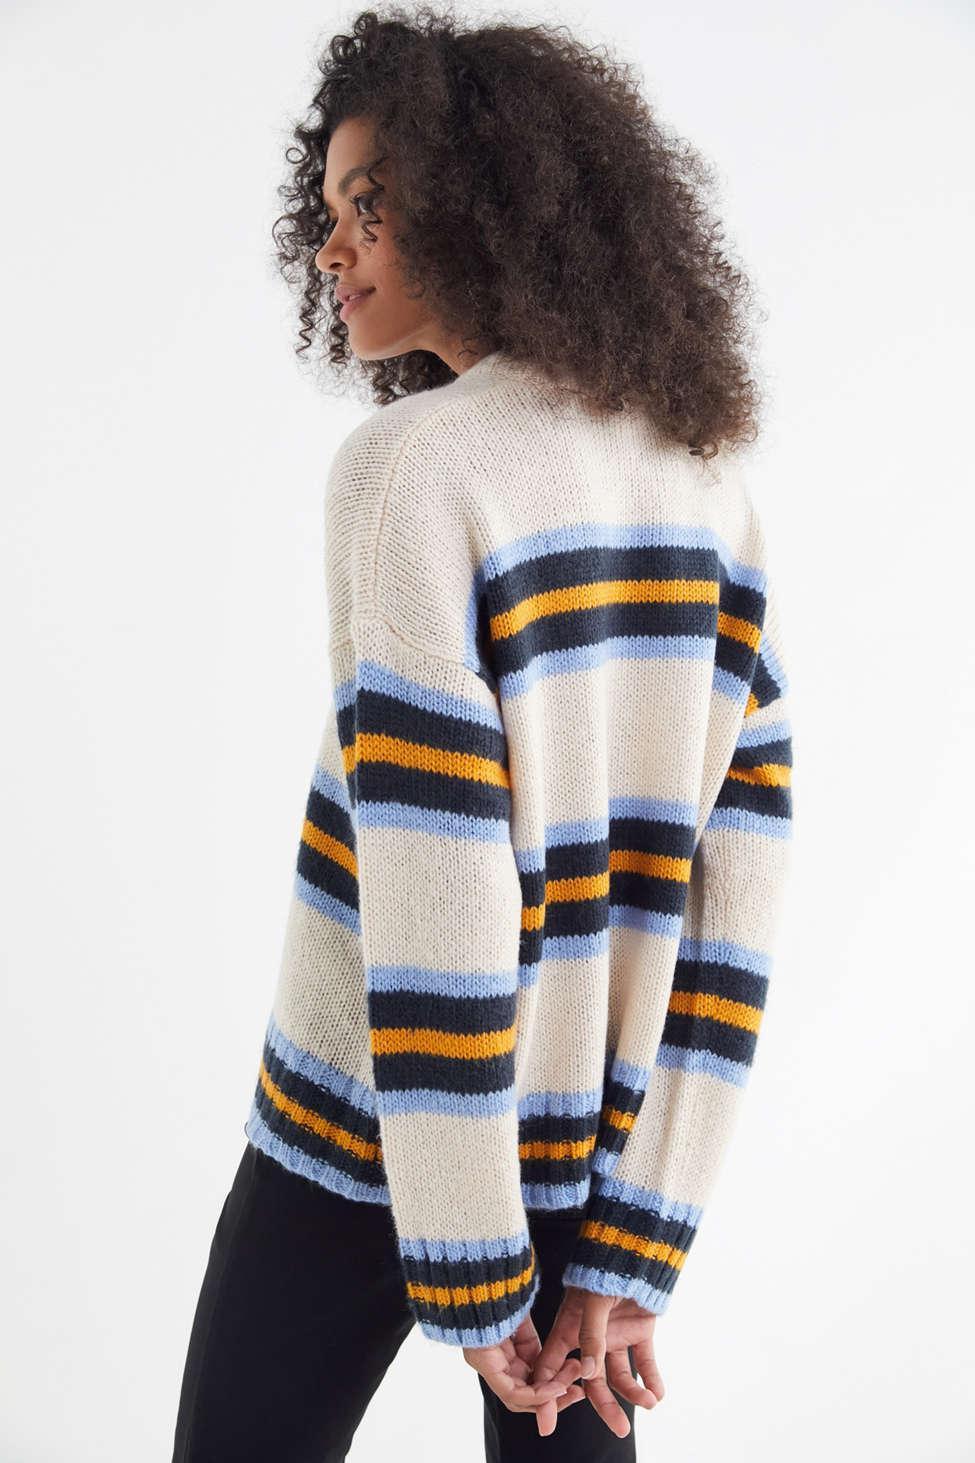 67869b44fa Urban Outfitters - Multicolor Uo Bobby Boyfriend Striped Crew-neck Sweater  - Lyst. View fullscreen